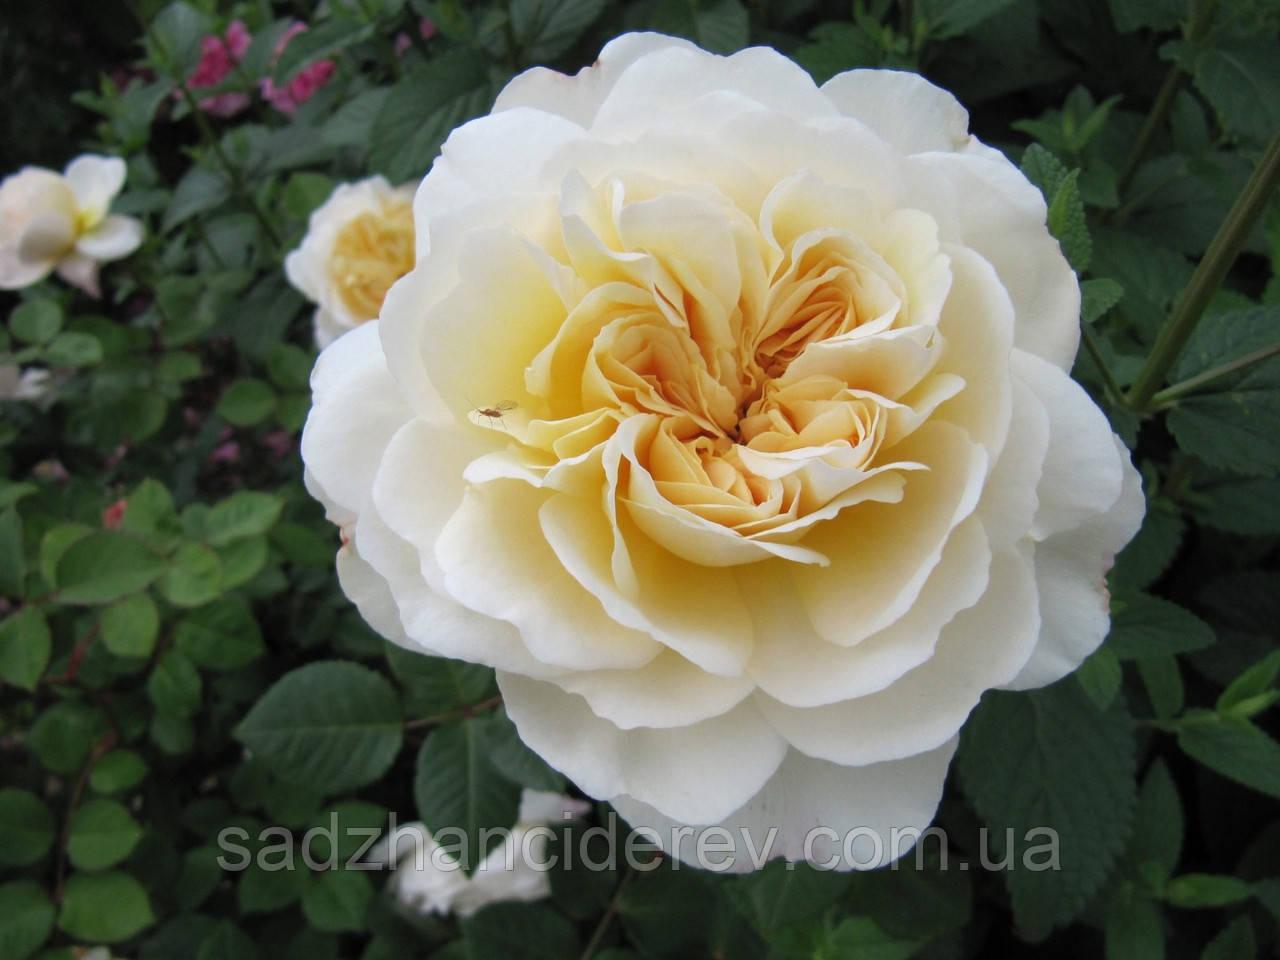 Саджанці троянд Крокус Роуз ( Rose Crocus)